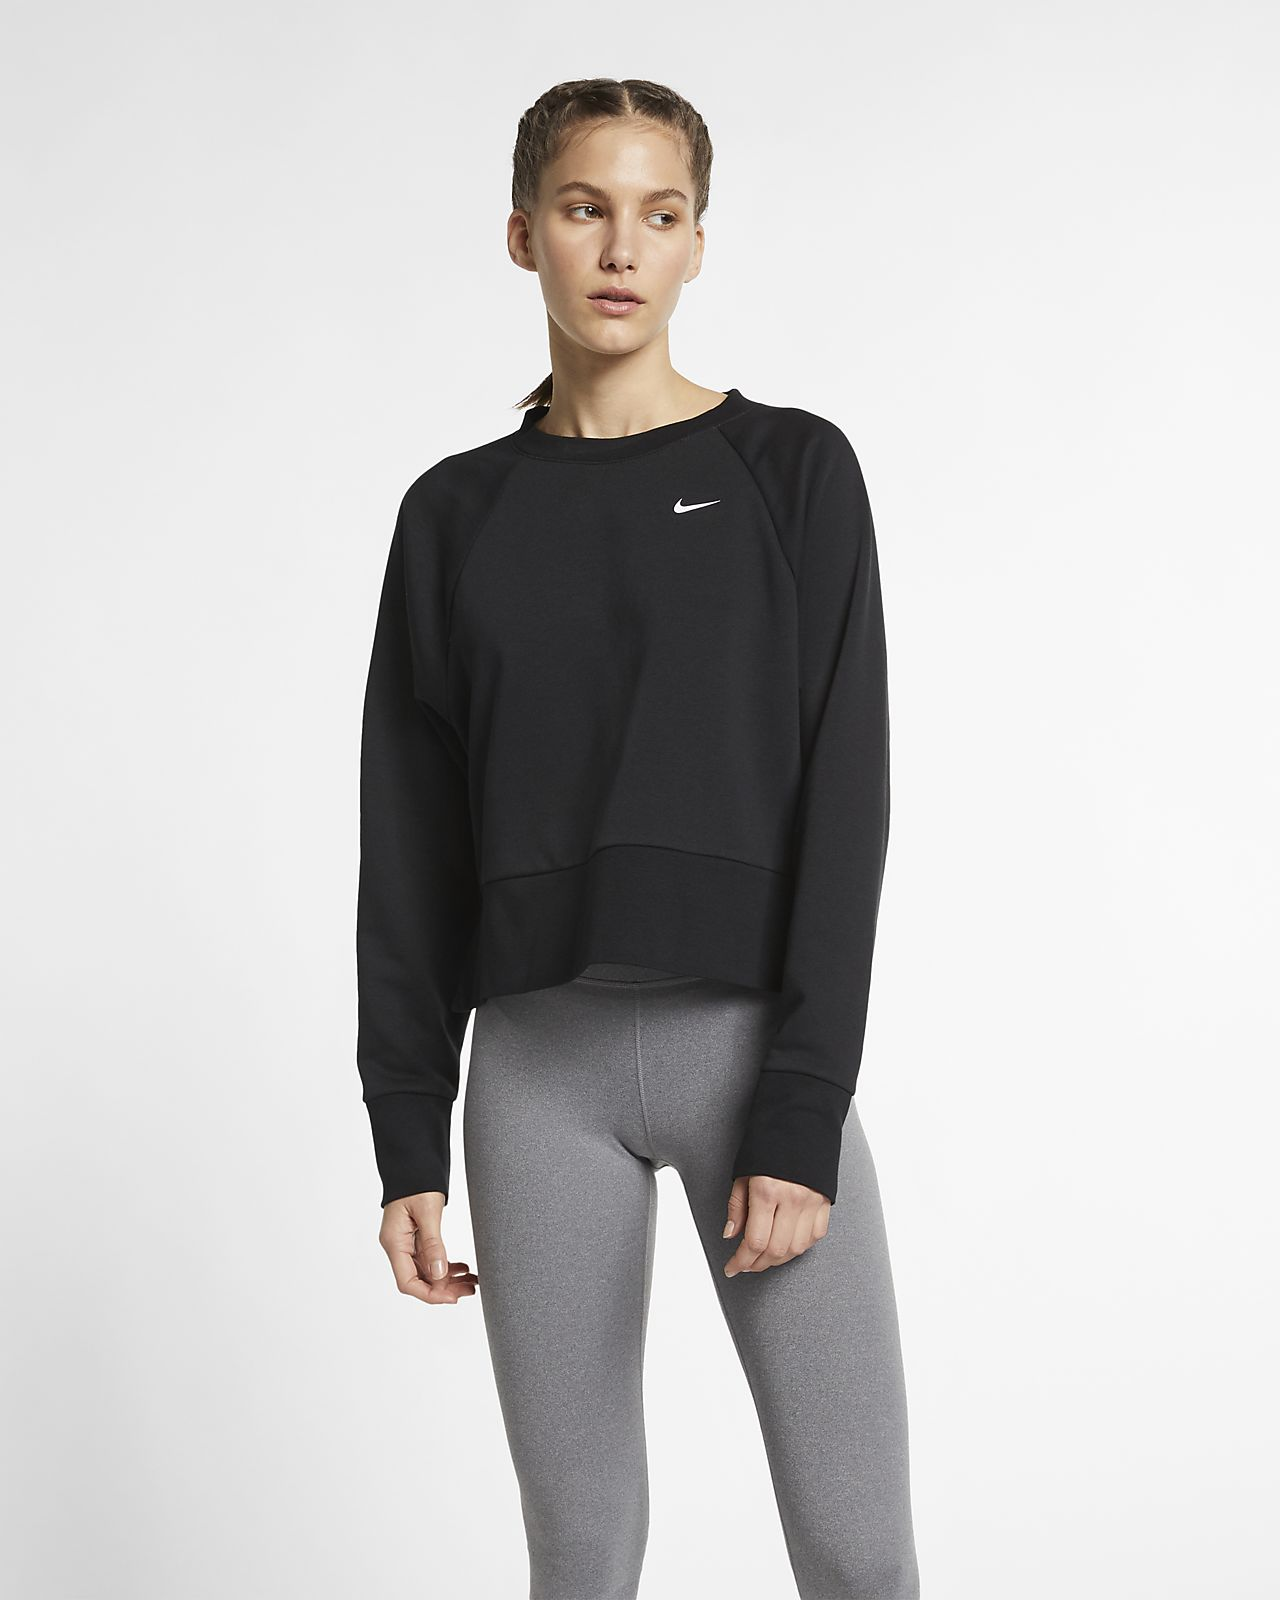 Nike Dri-FIT Yogatrainingstop met lange mouwen voor dames